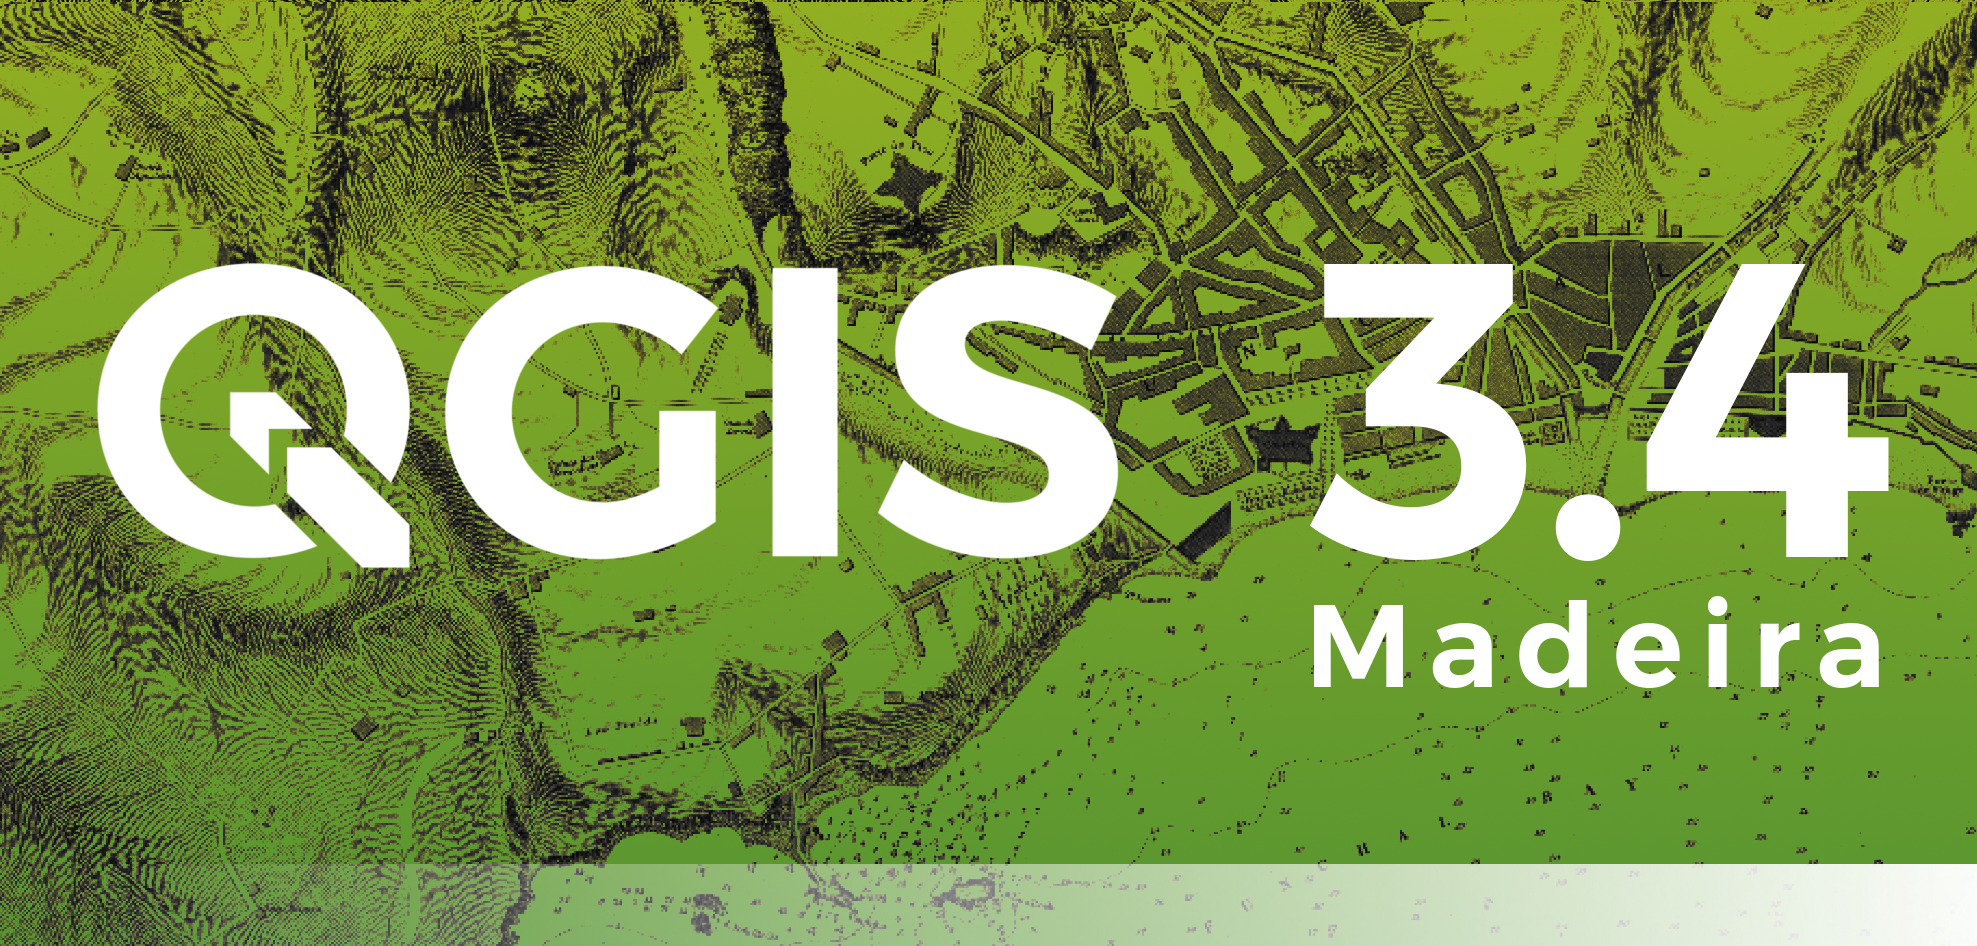 QGIS 3.4 Madeira released